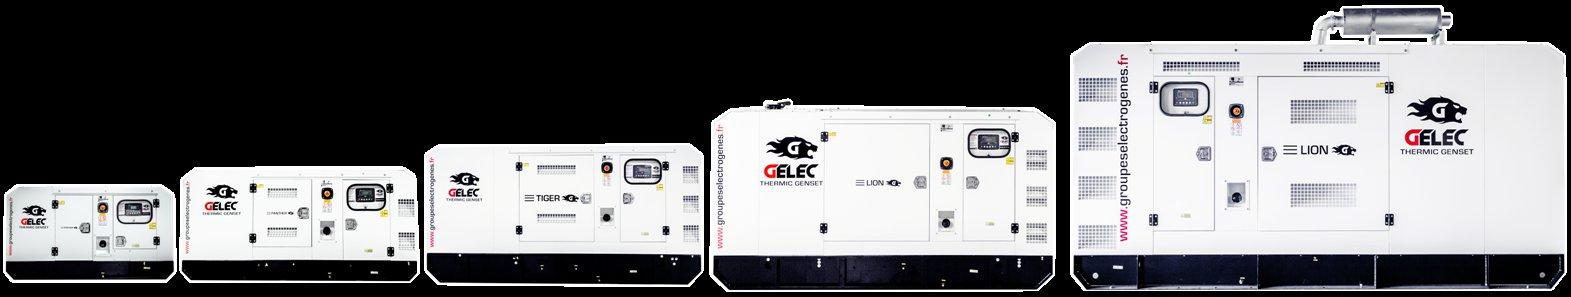 gamme groupes électrogènes gelec energy